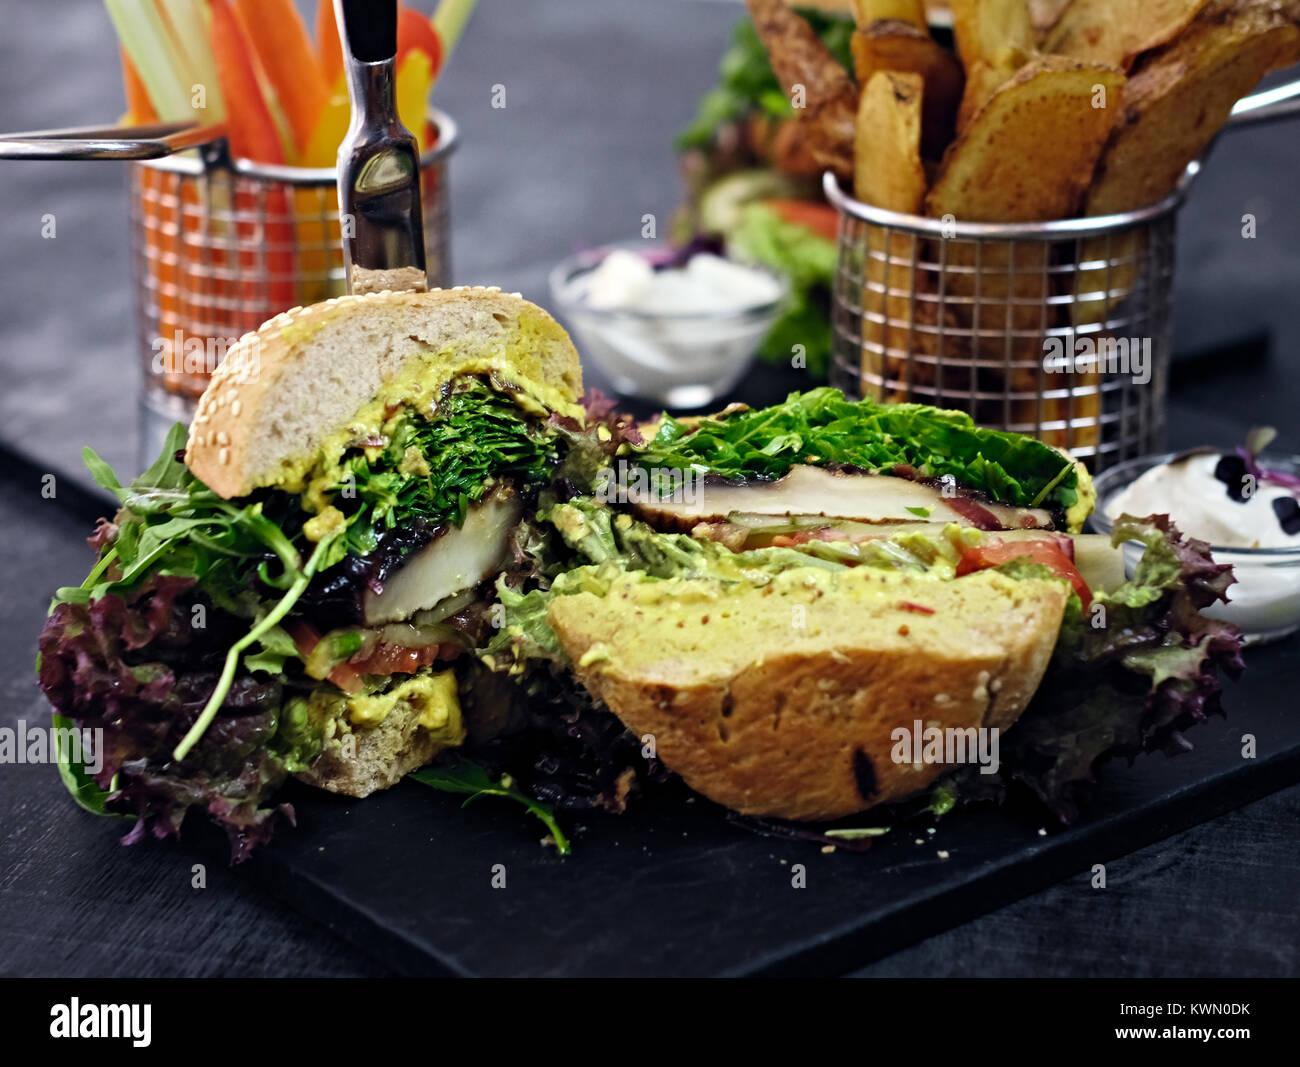 Vegan Pilz Burger mit Salat Stockbild